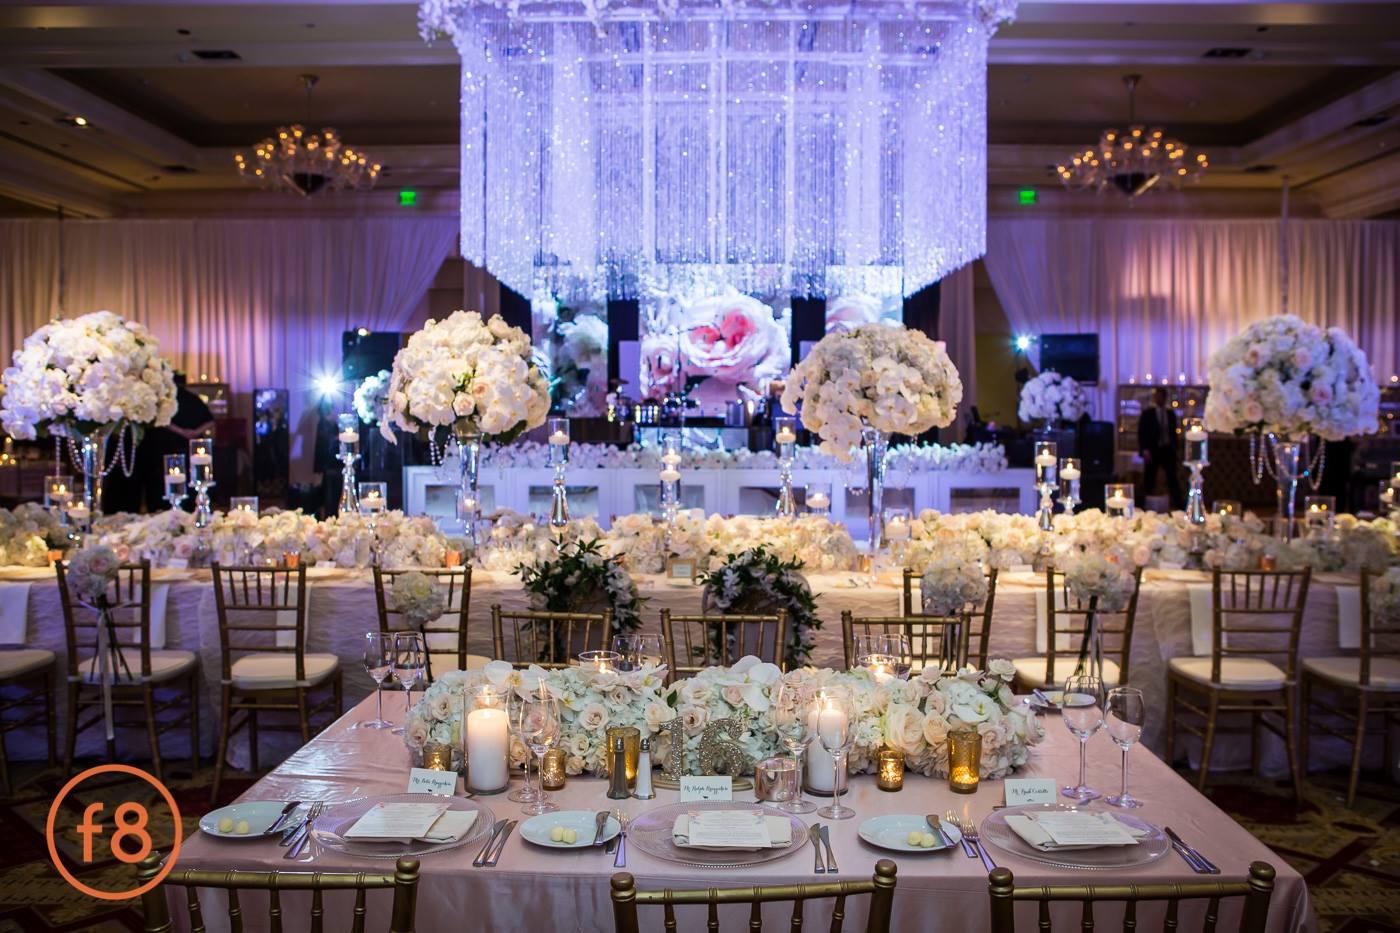 Weddings by StarDust - Weddings by StarDust